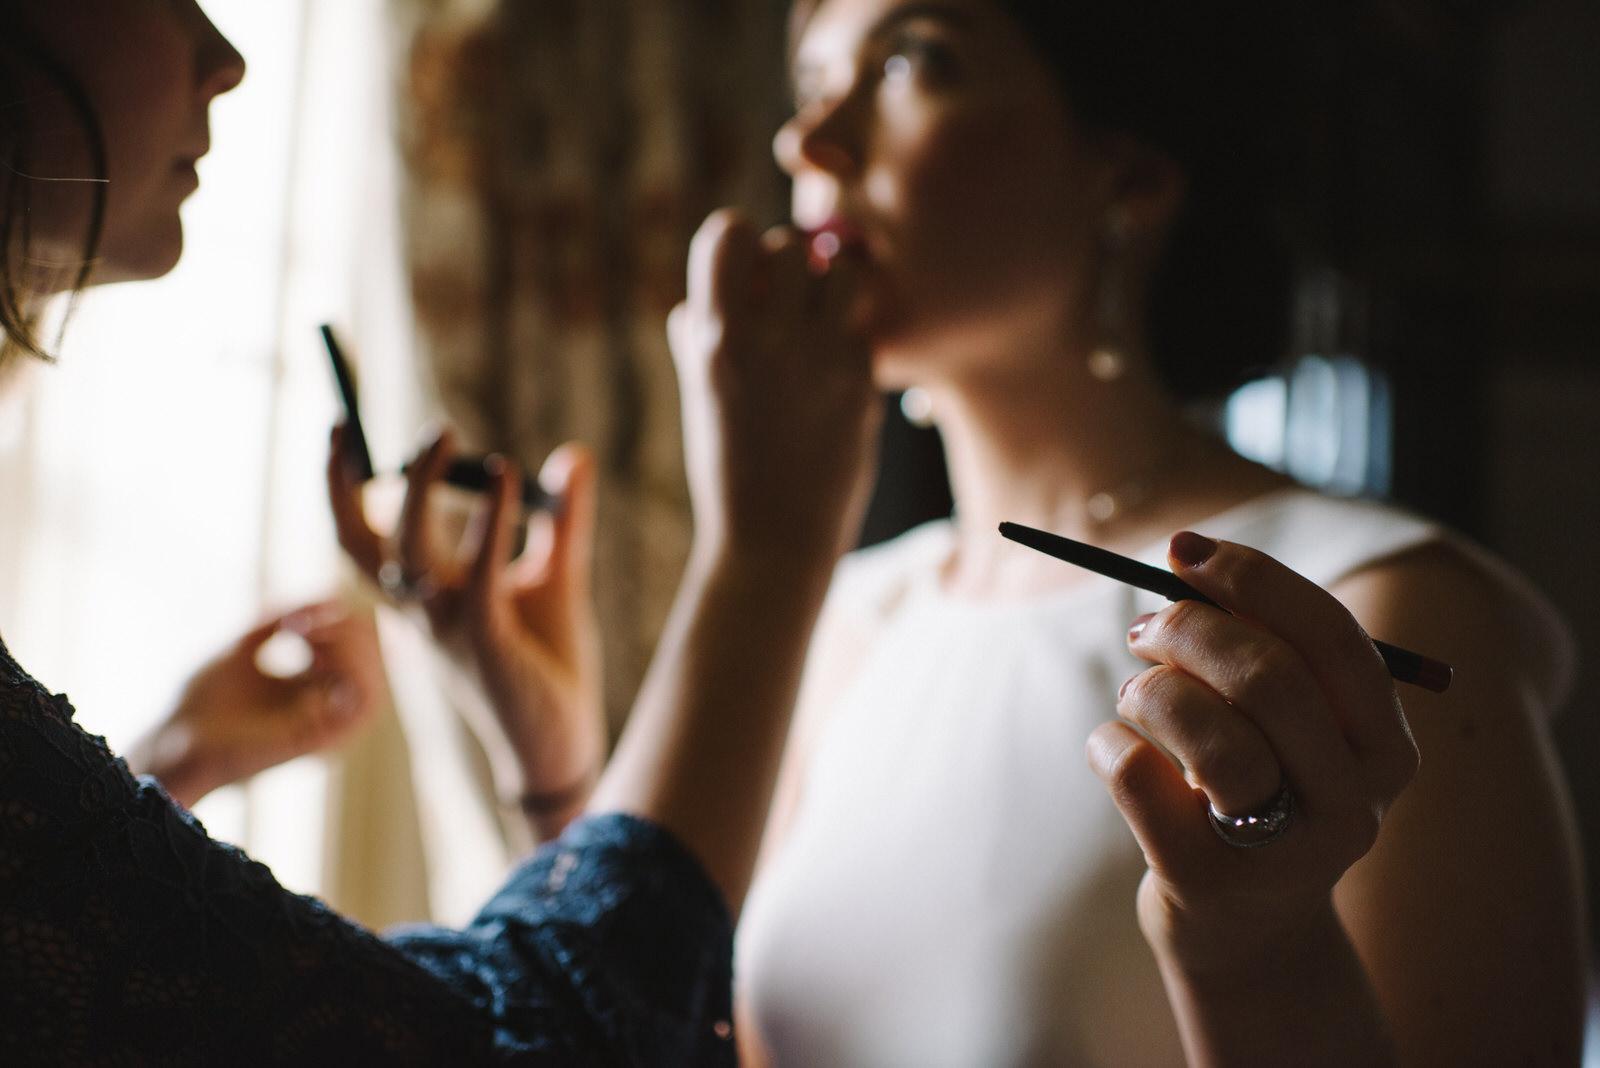 013-COLSTOUN-HOUSE-WEDDING-ALTERNATIVE-WEDDING-PHOTOGRAPHER-GLASGOW-WEDDING-PHOTOGRAPHER-STYLISH-SCOTTISH-WEDDING.JPG